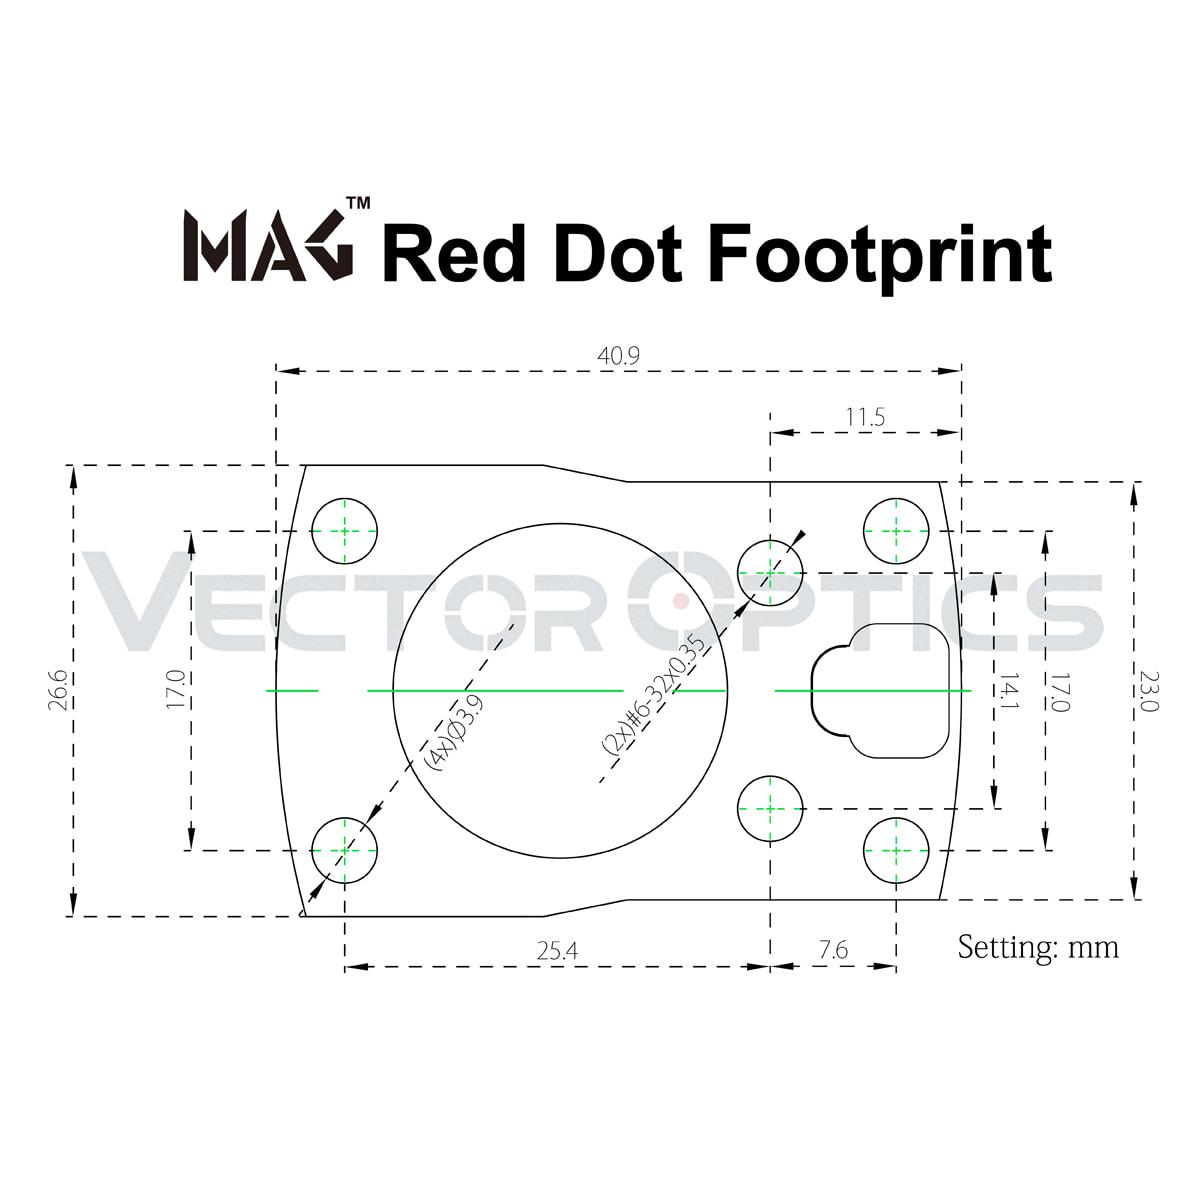 VO MAG Footprint Acom Diagram